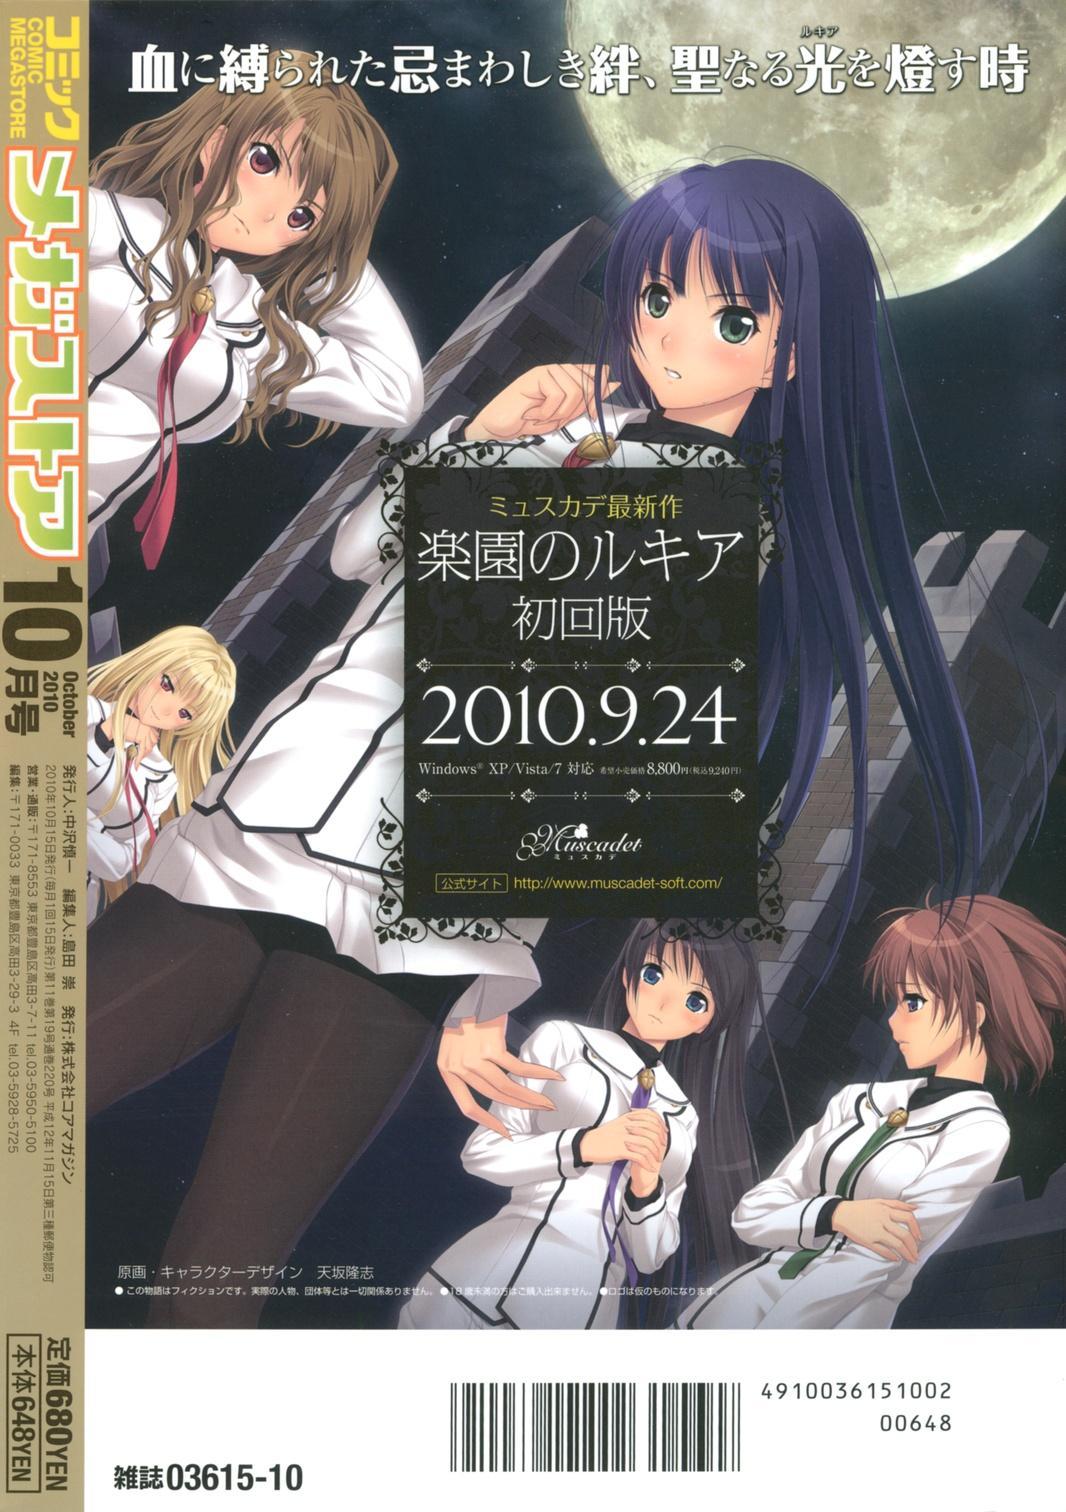 COMIC Megastore 2010-10 516